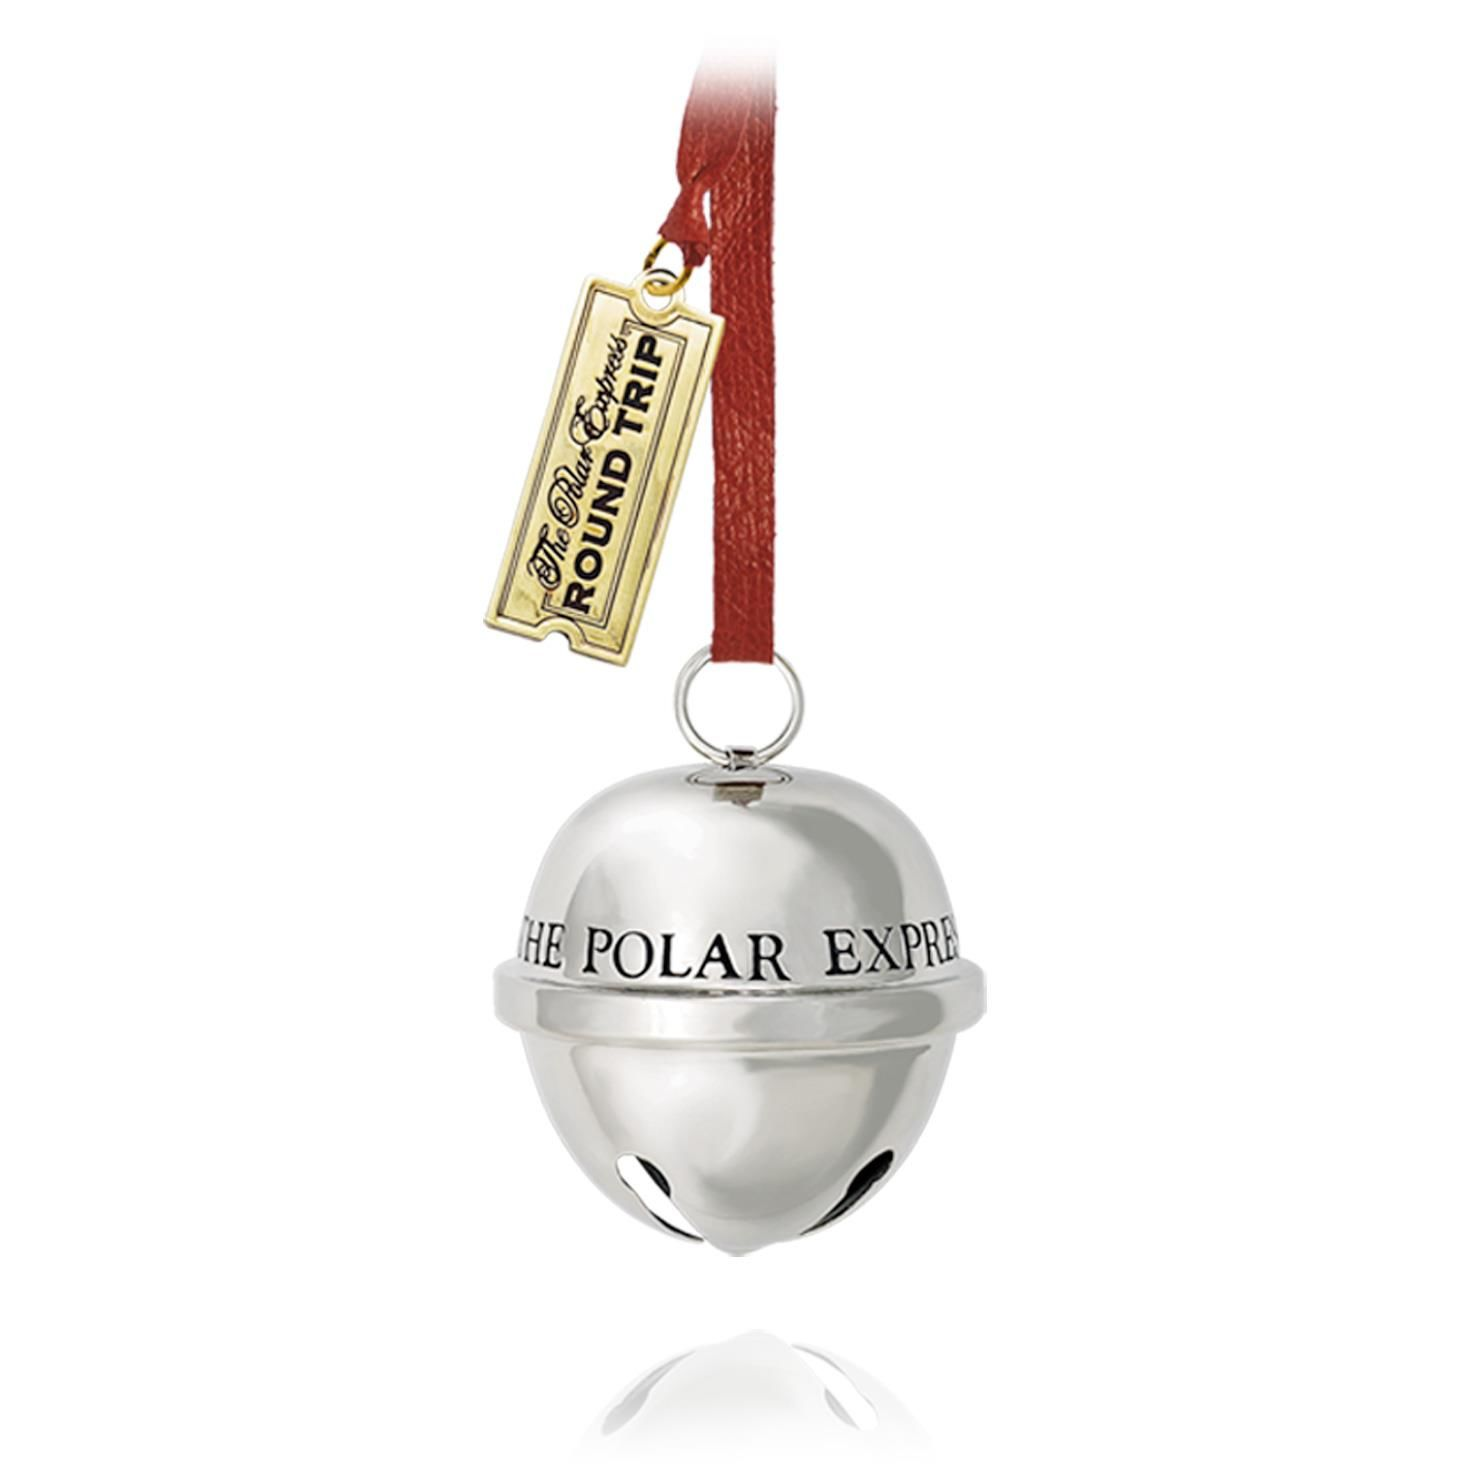 Polar express sleigh bell hallmark ornament hooked